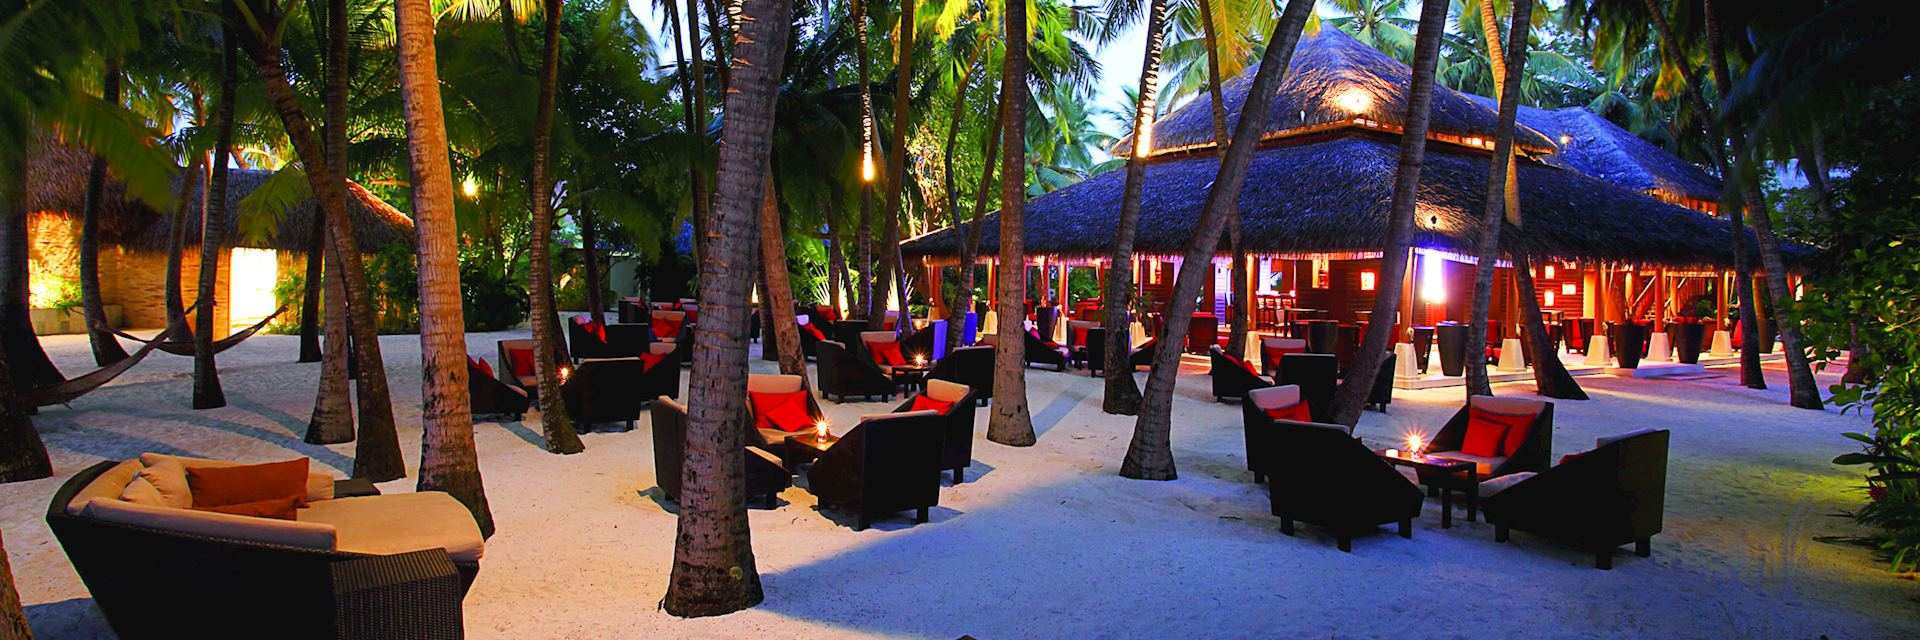 Sails Bar in Baros Maldives